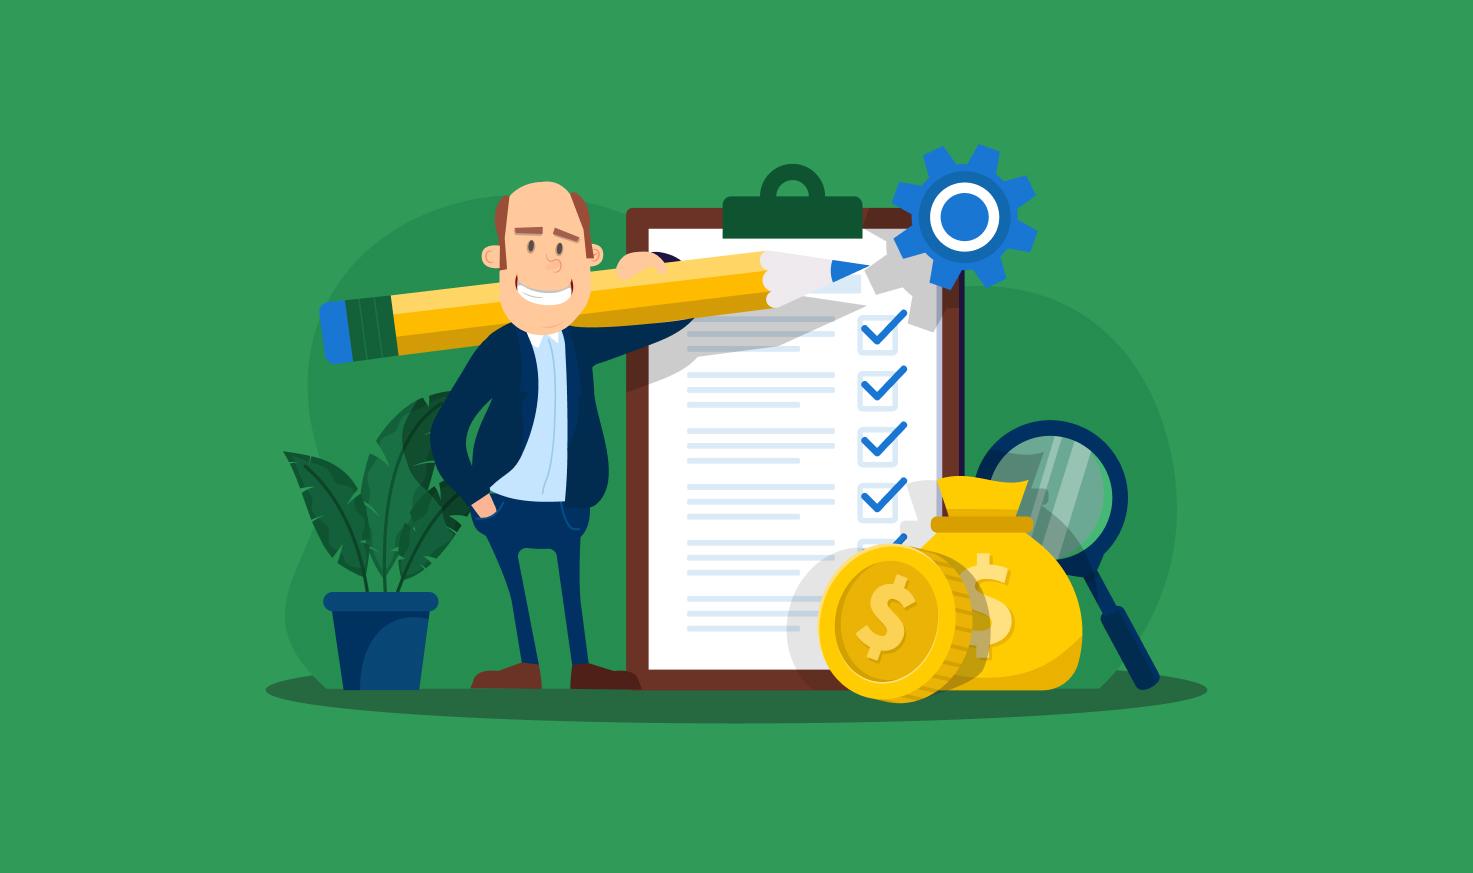 Financial Advisor Checklist for Clients